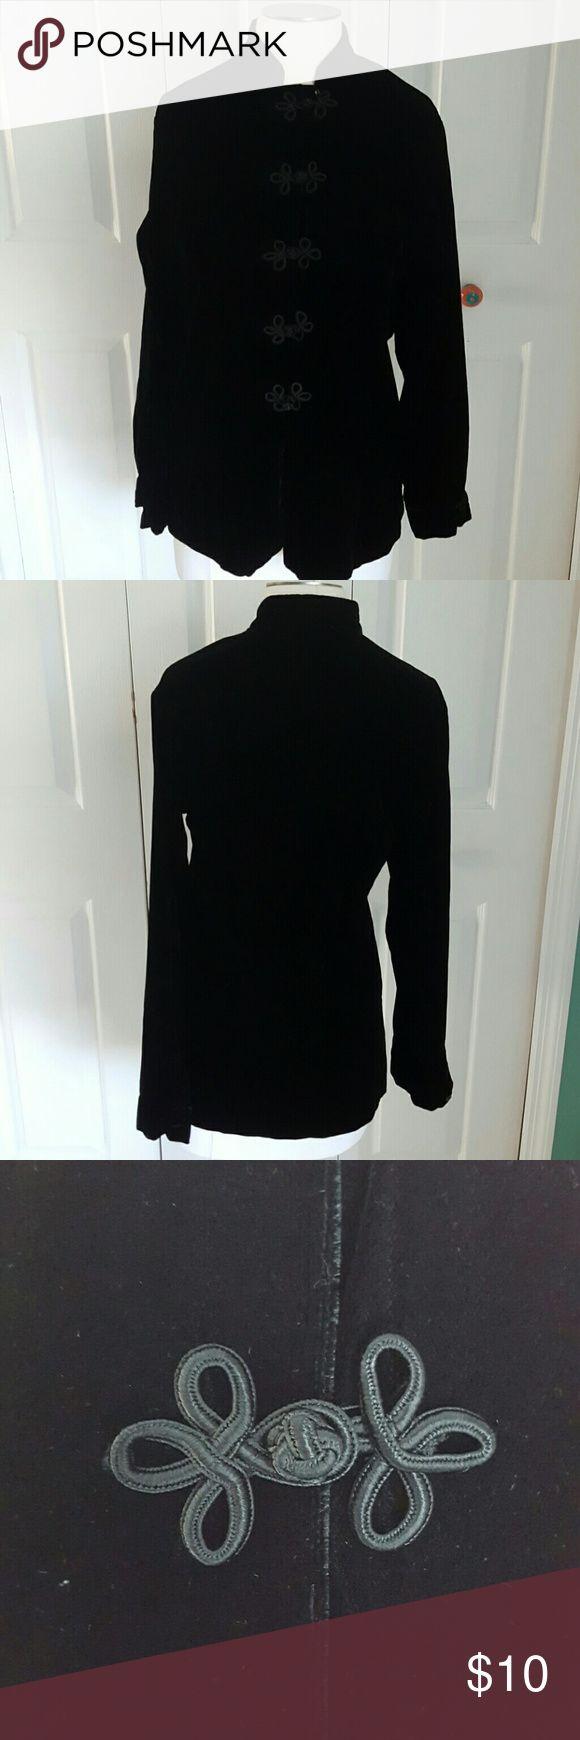 Brooks Brothers Black Velvet Jacket, size M Black velvet jacket by Brooks Brothers, size Medium Brooks Brothers Jackets & Coats